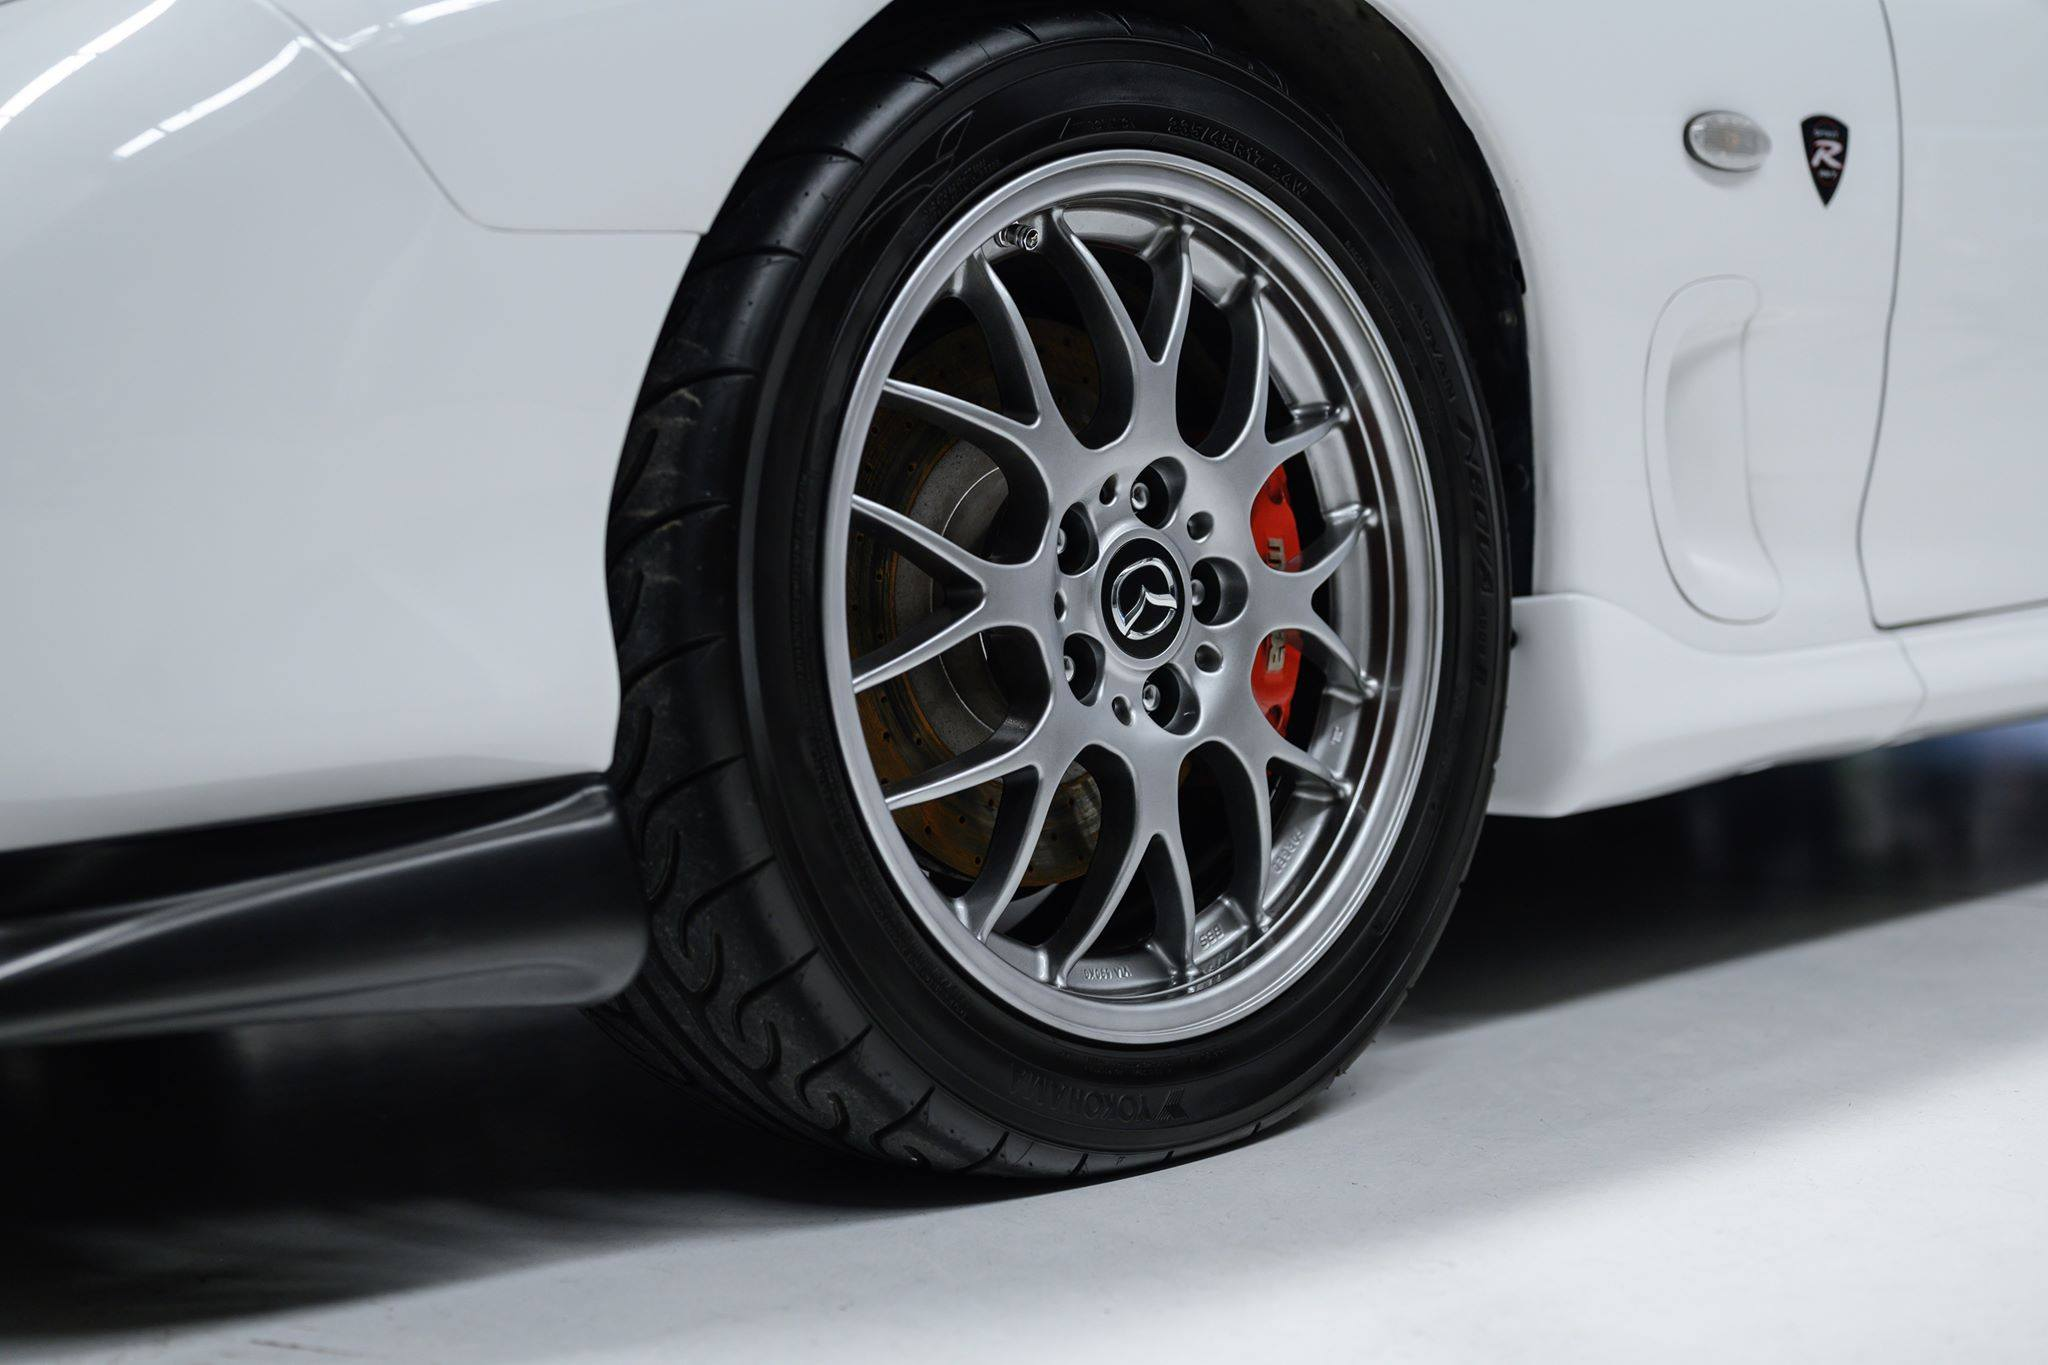 2002_Mazda_RX-7_Spirit-R_Type-A_sale_0013